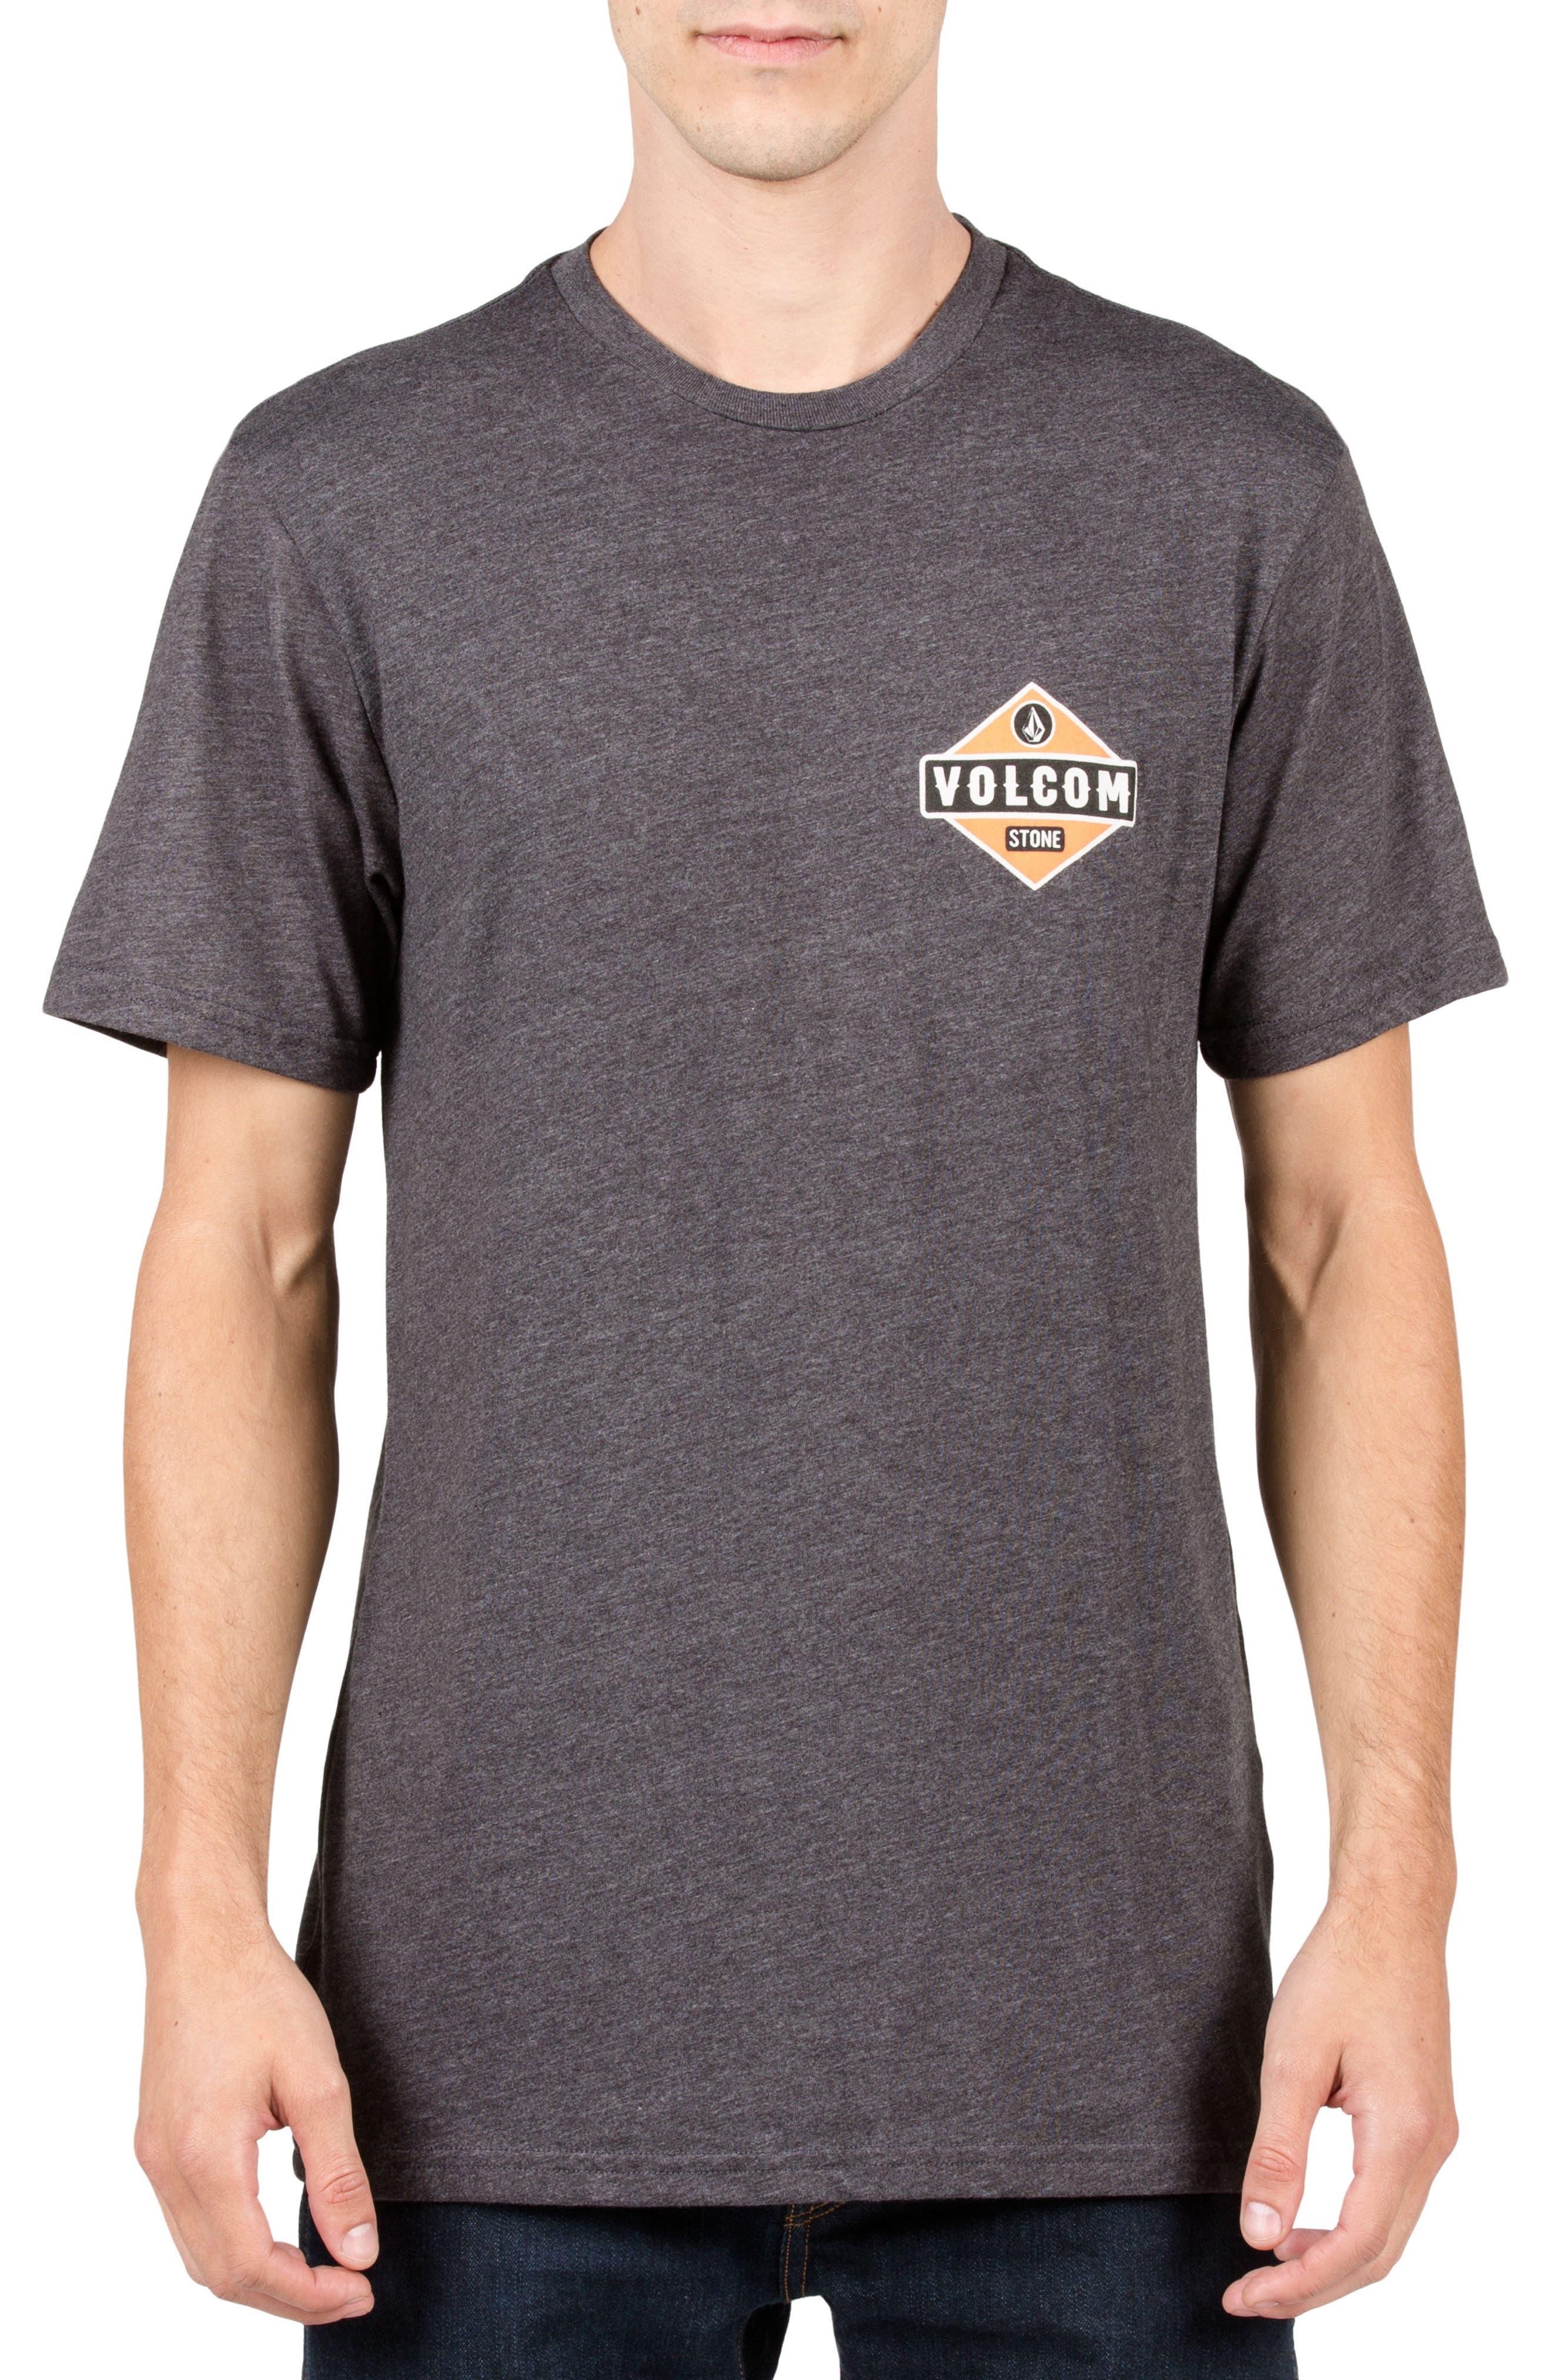 VOLCOM Caution Graphic T-Shirt